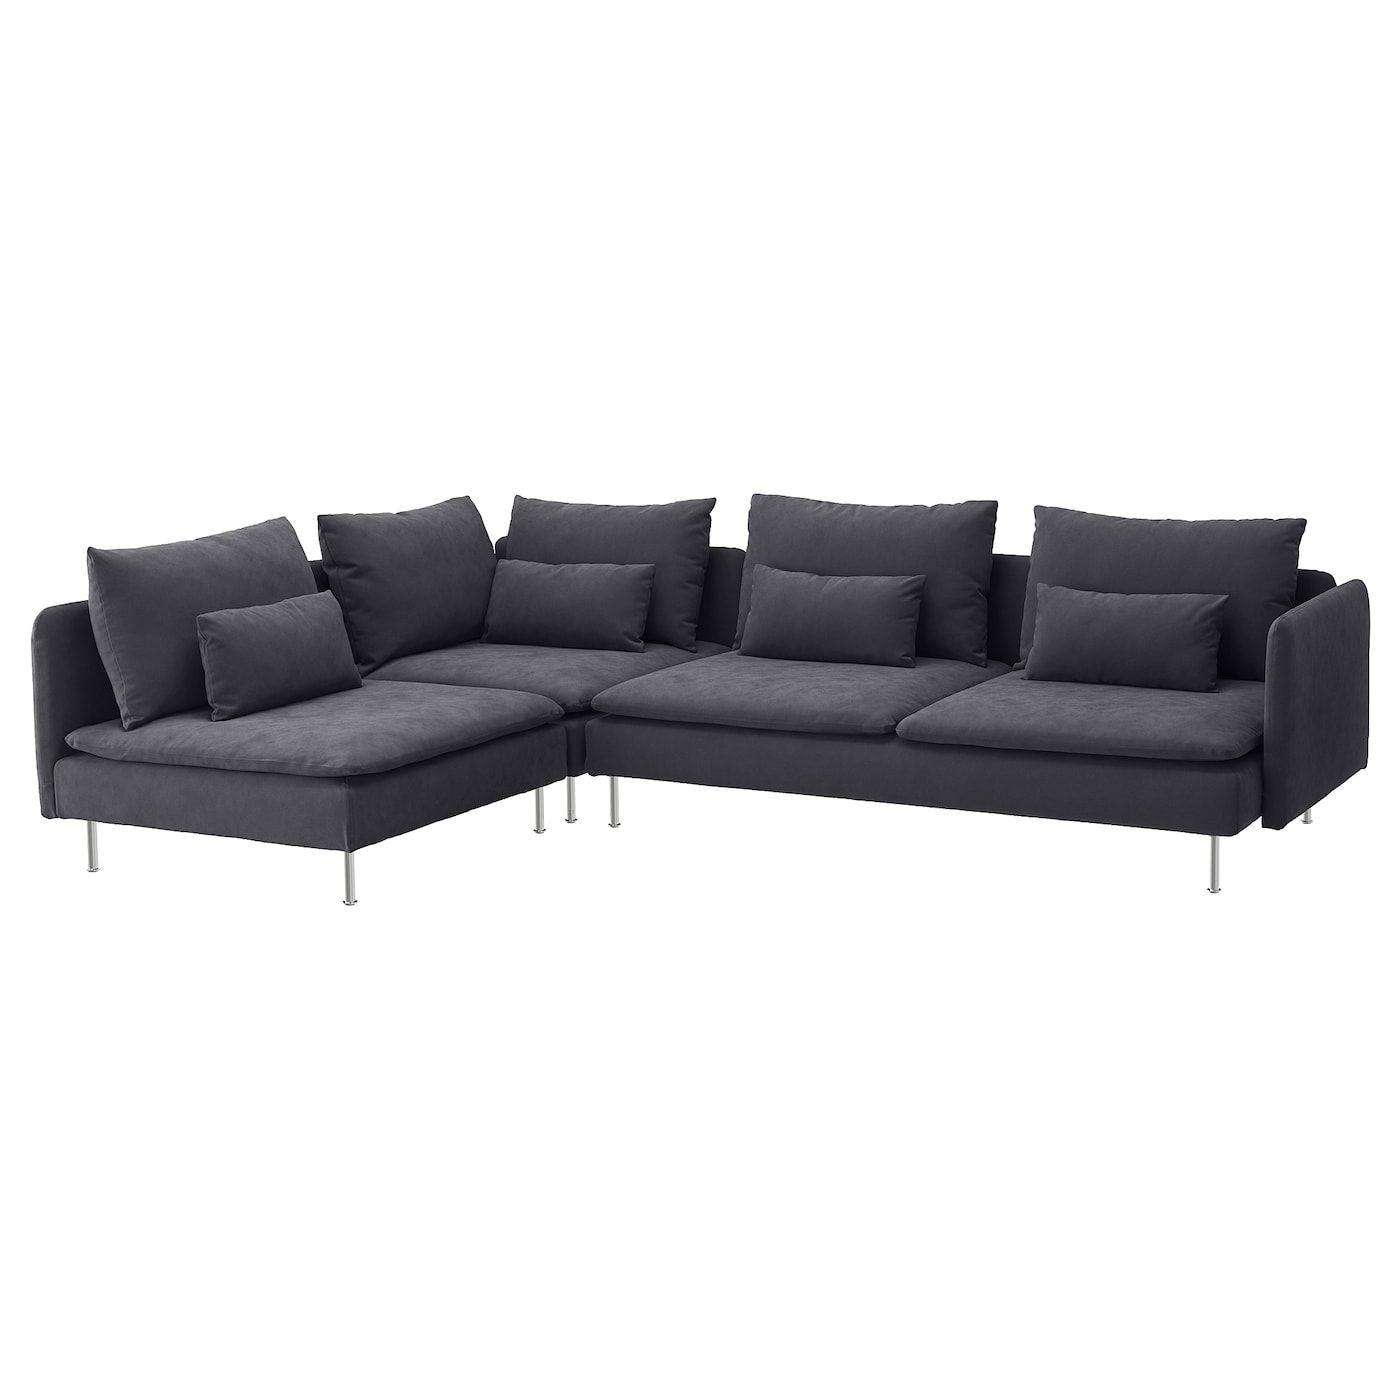 Soderhamn Sectional 4 Seat Corner With Open End Samsta Dark Gray Canape Angle Mobilier De Salon Ikea